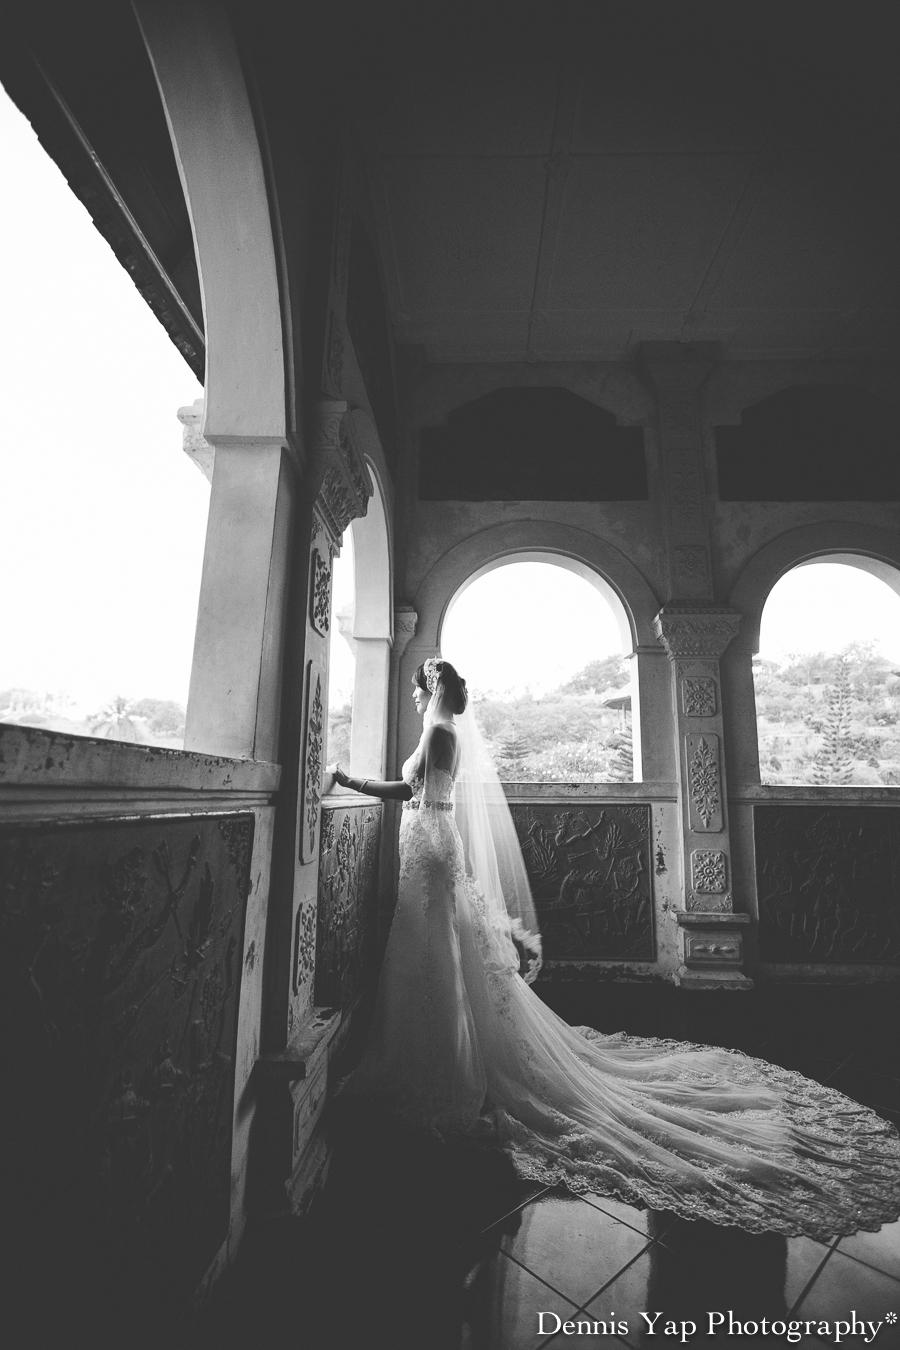 hwee jenna pre wedding bali indonesia dennis yap photography malaysia wedding photographer asia top 30 beloved-12.jpg